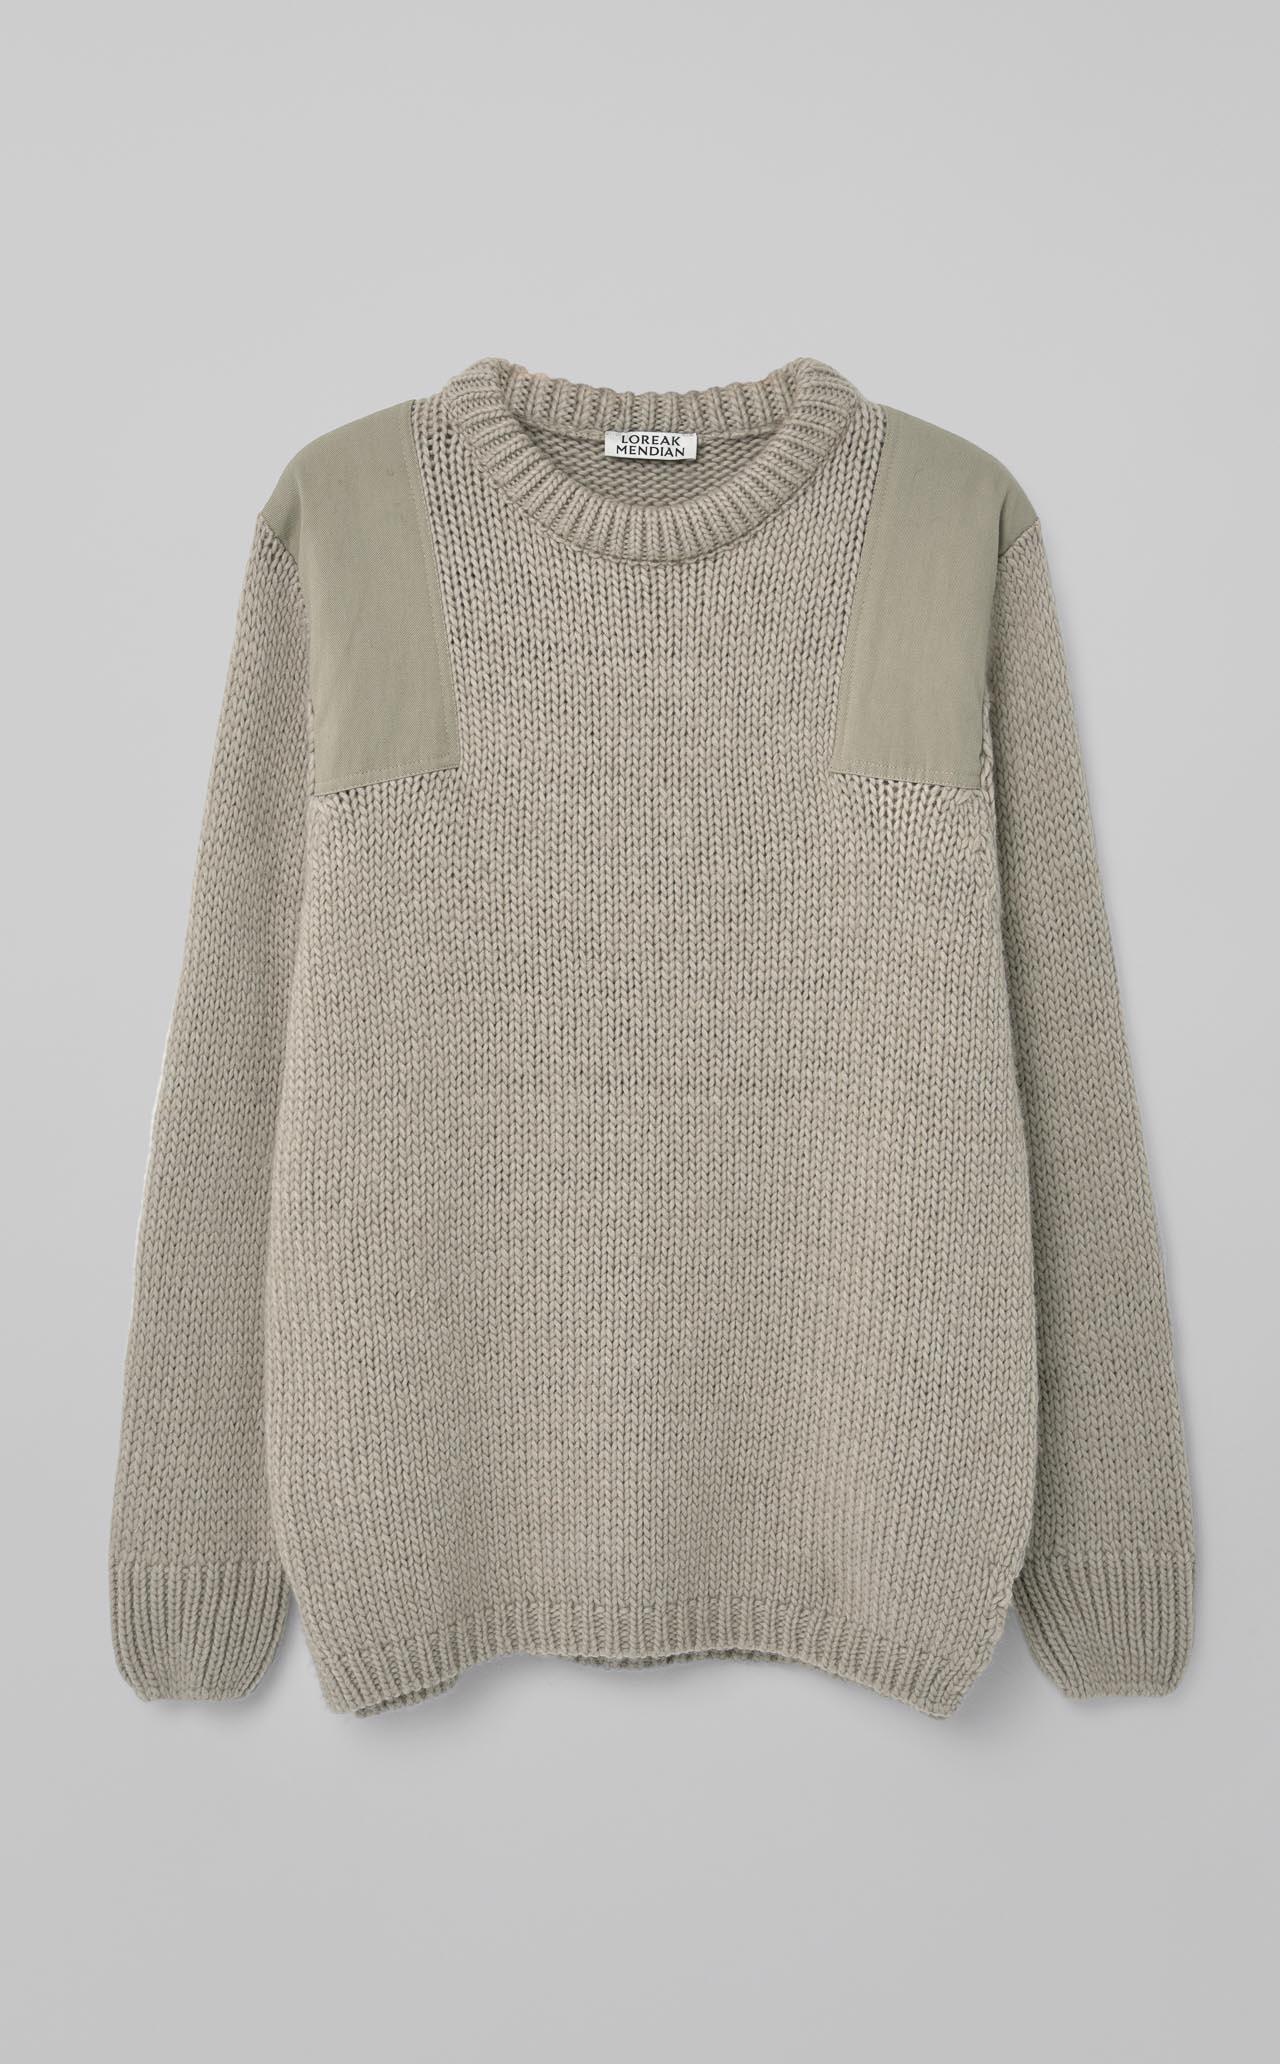 Enzo Sweater